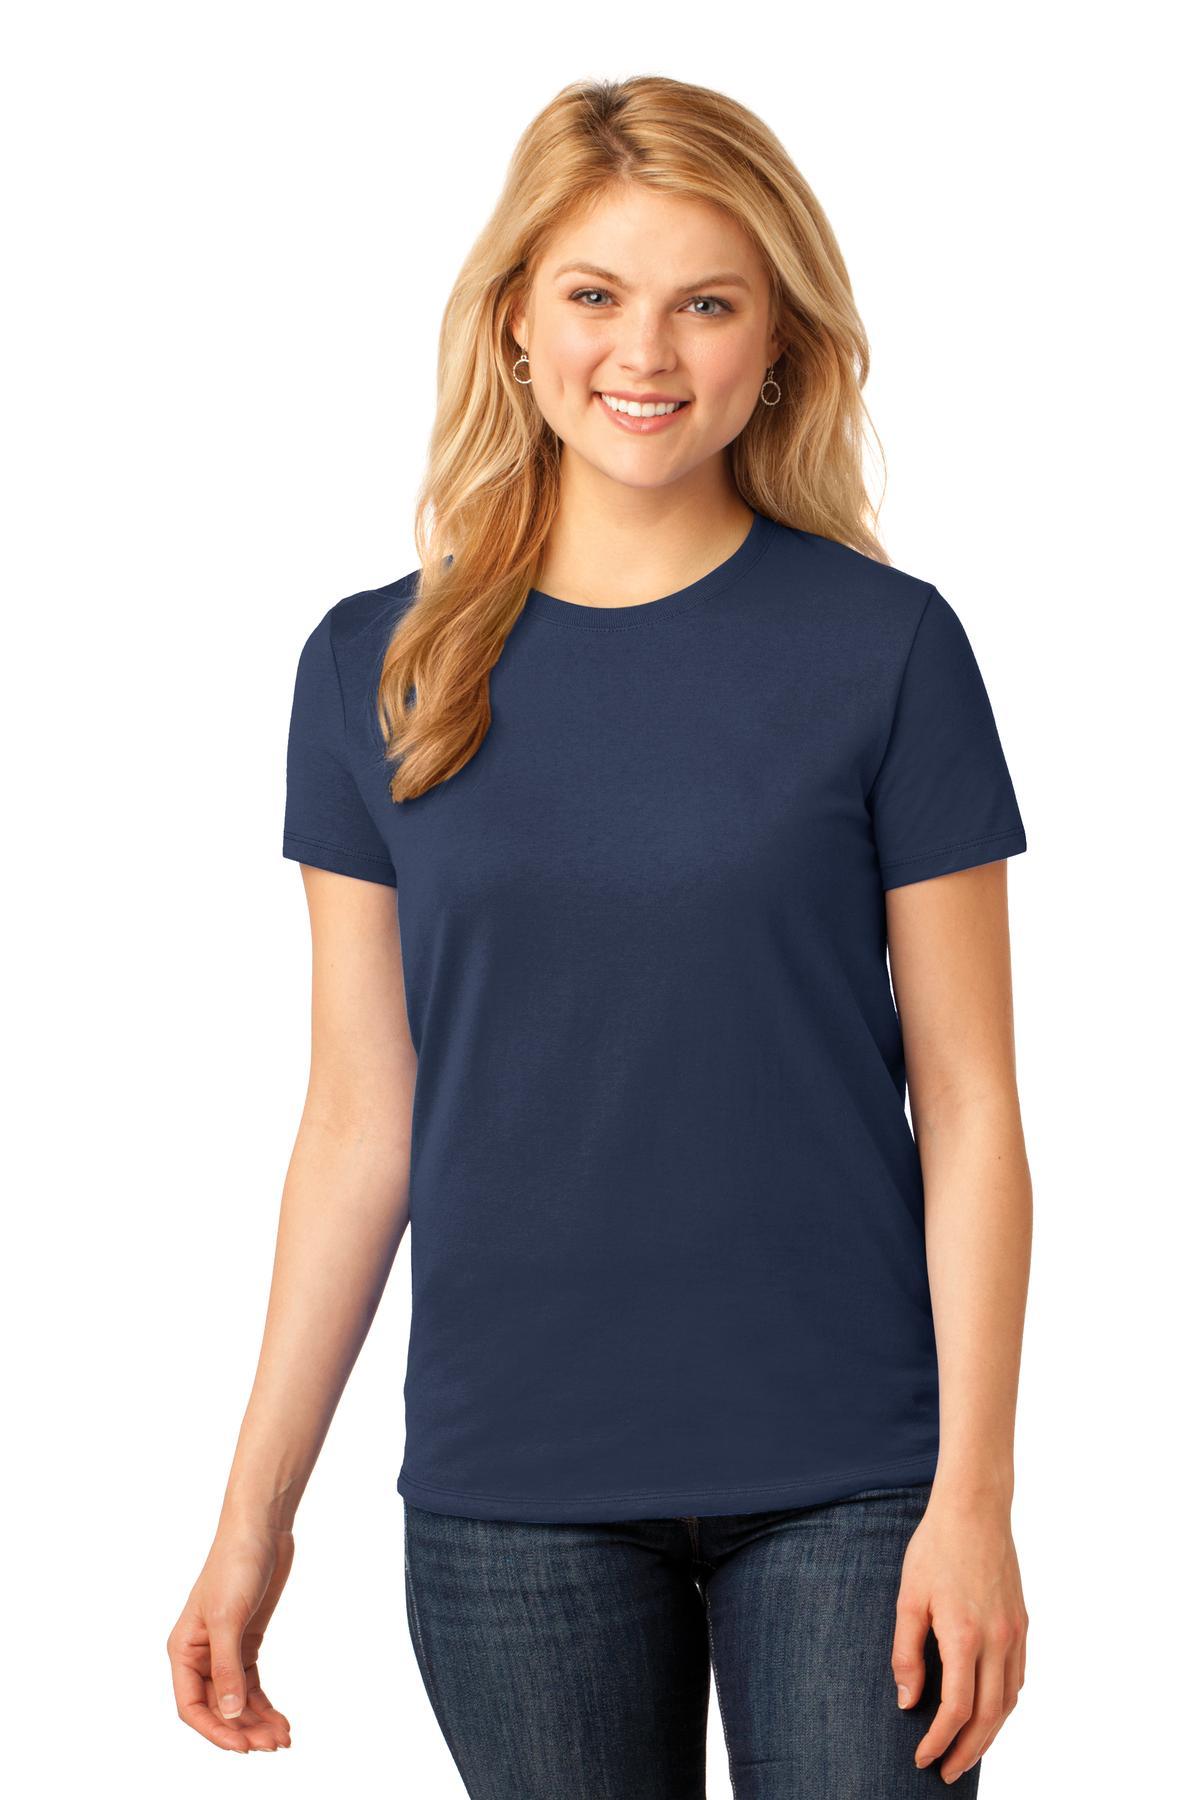 a94645fa4c Port & Company ® Ladies Core Cotton Tee. LPC54